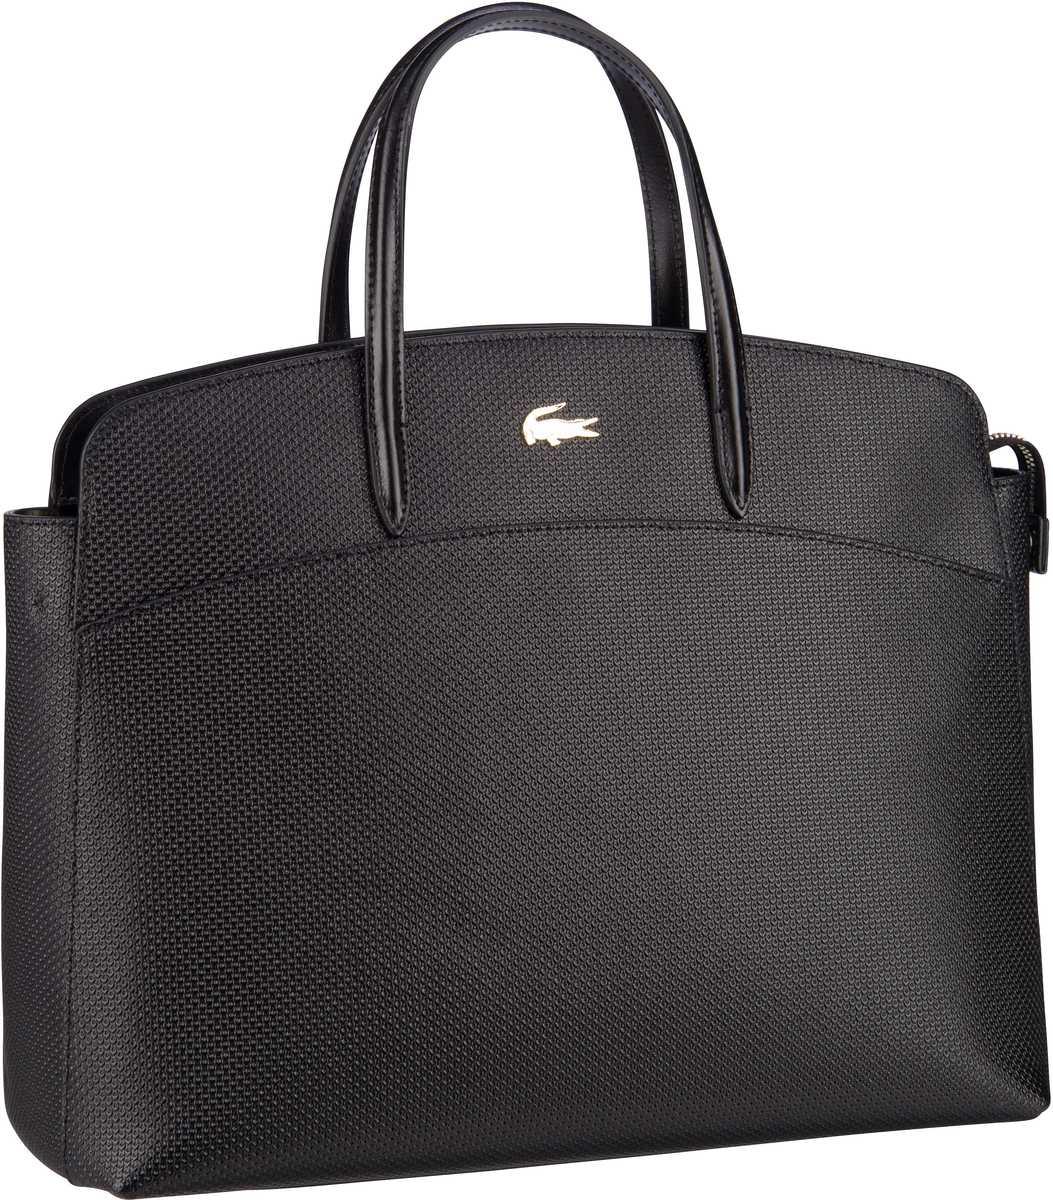 Handtasche Pockets Shopping Bag 2736 Black